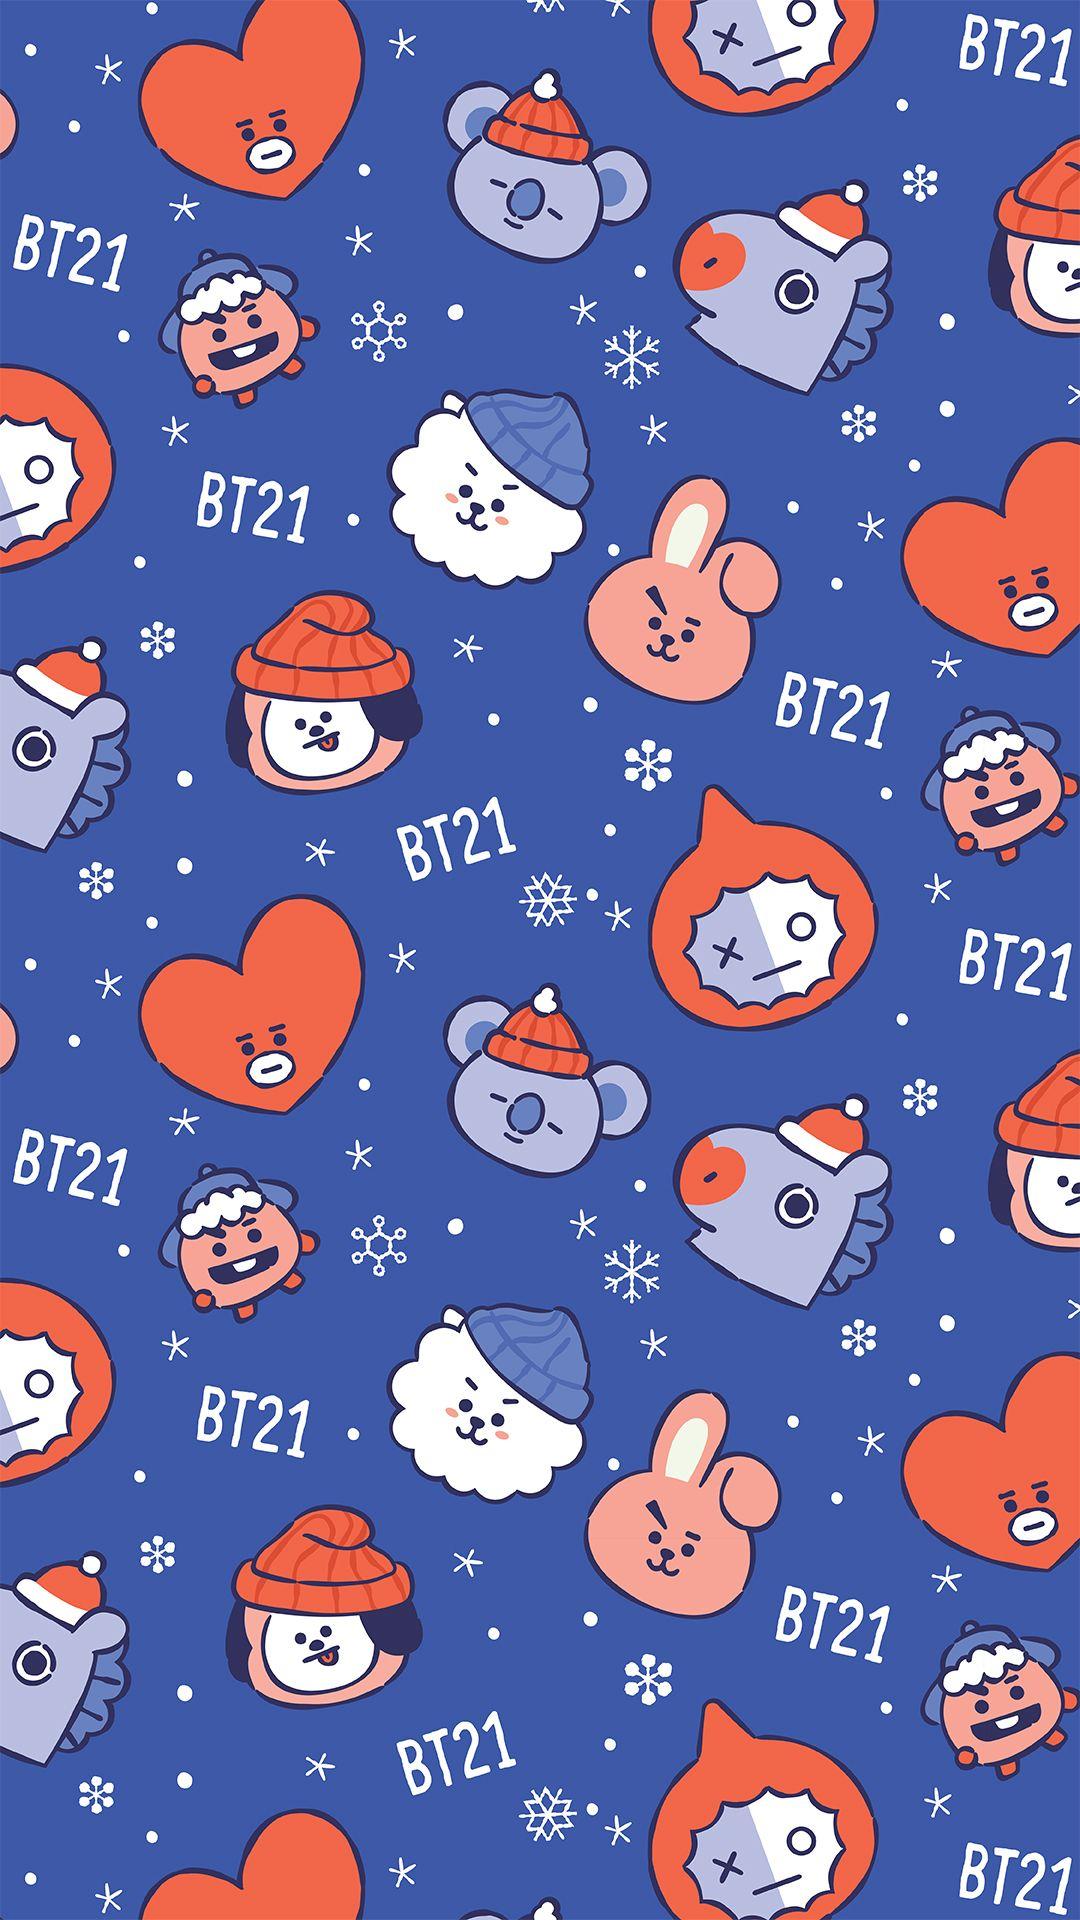 bt21,wallpaper,winter,shooky,rj,cooky,van,koya,tata,mang